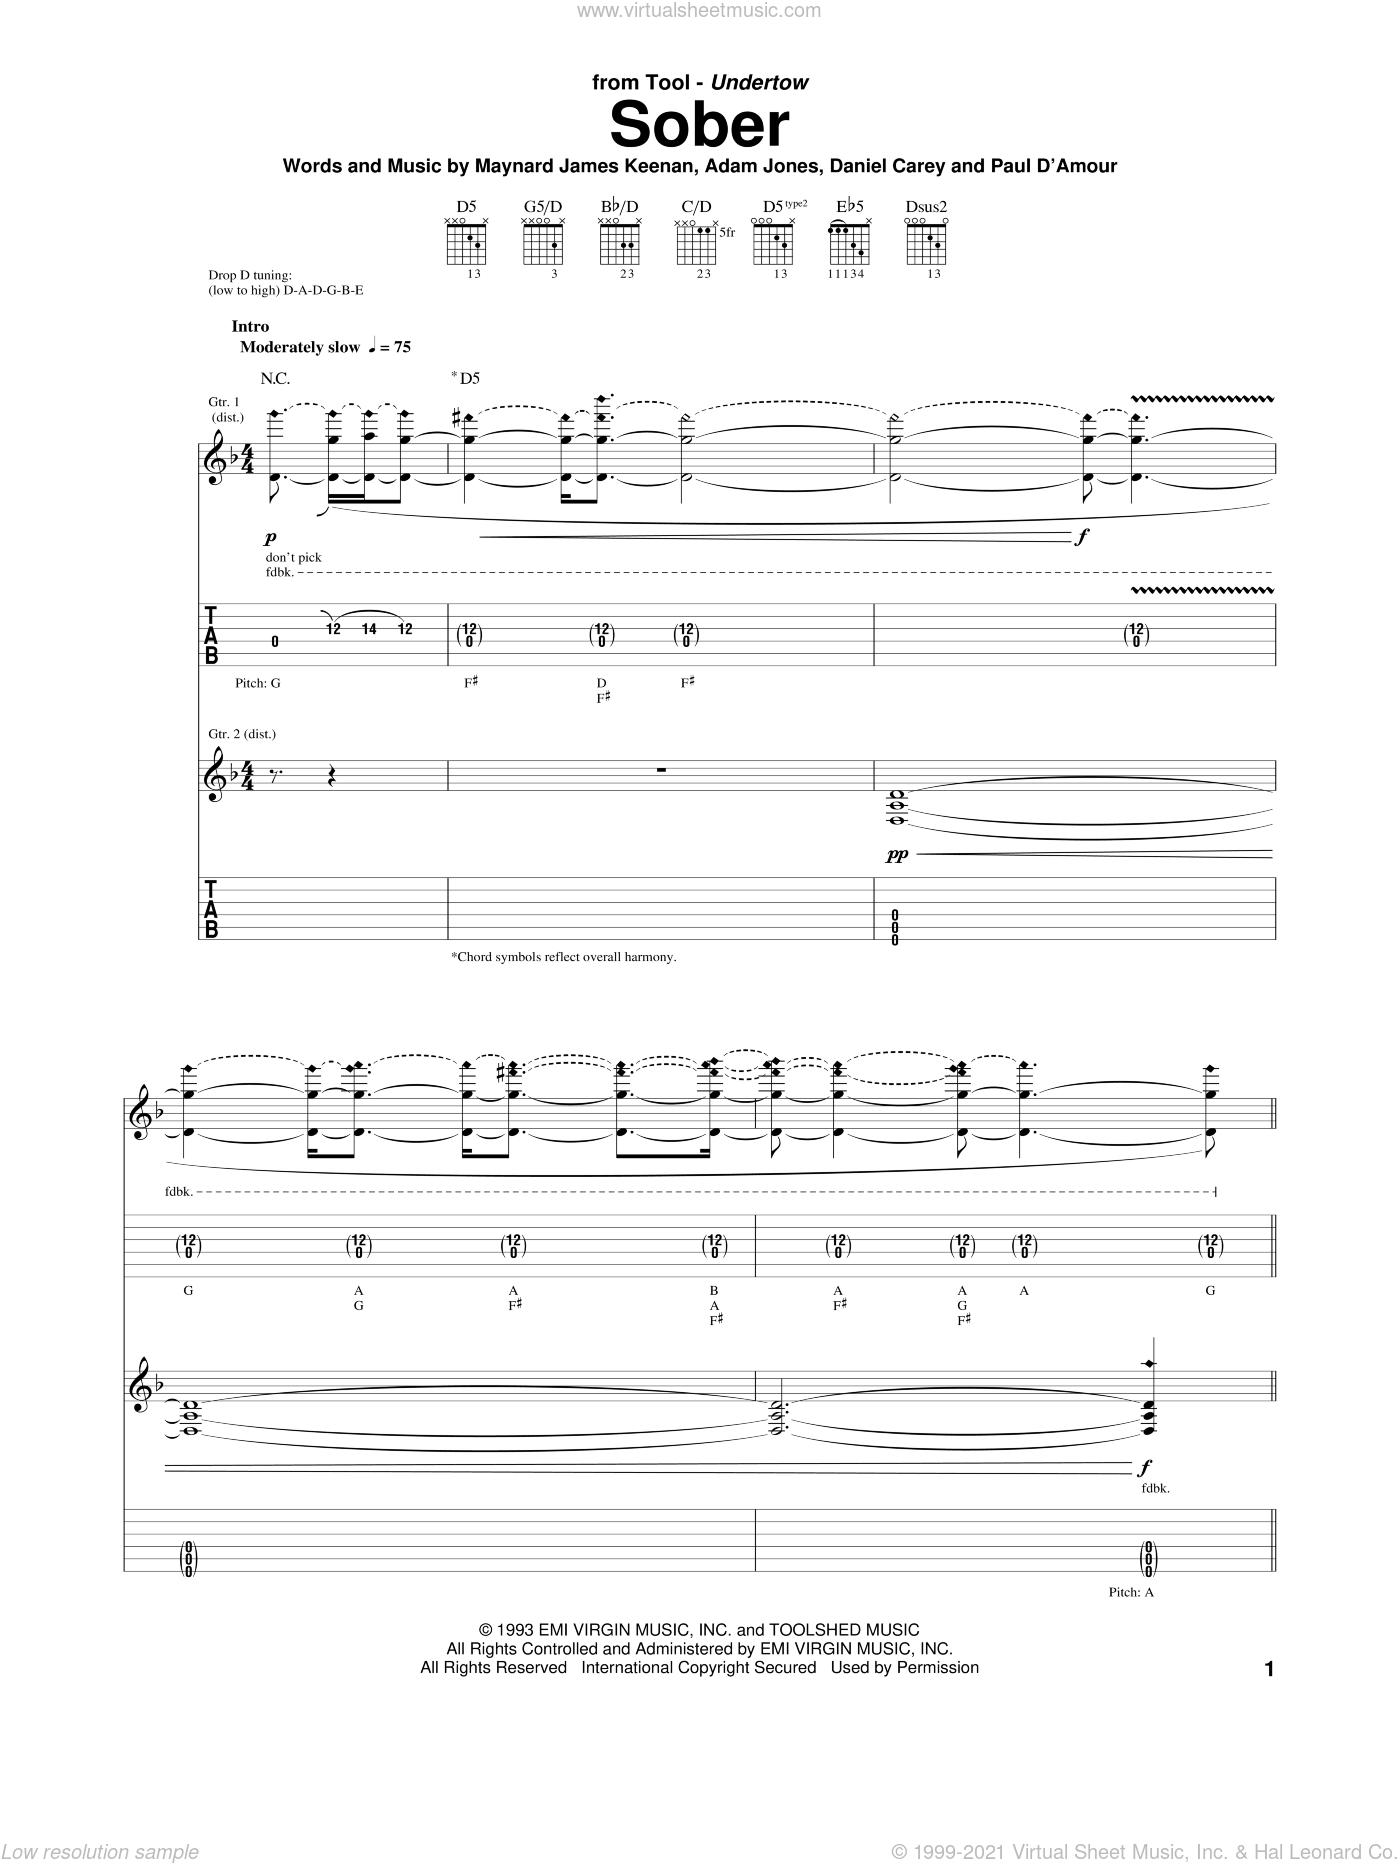 Tool - Sober sheet music for guitar (tablature) [PDF]